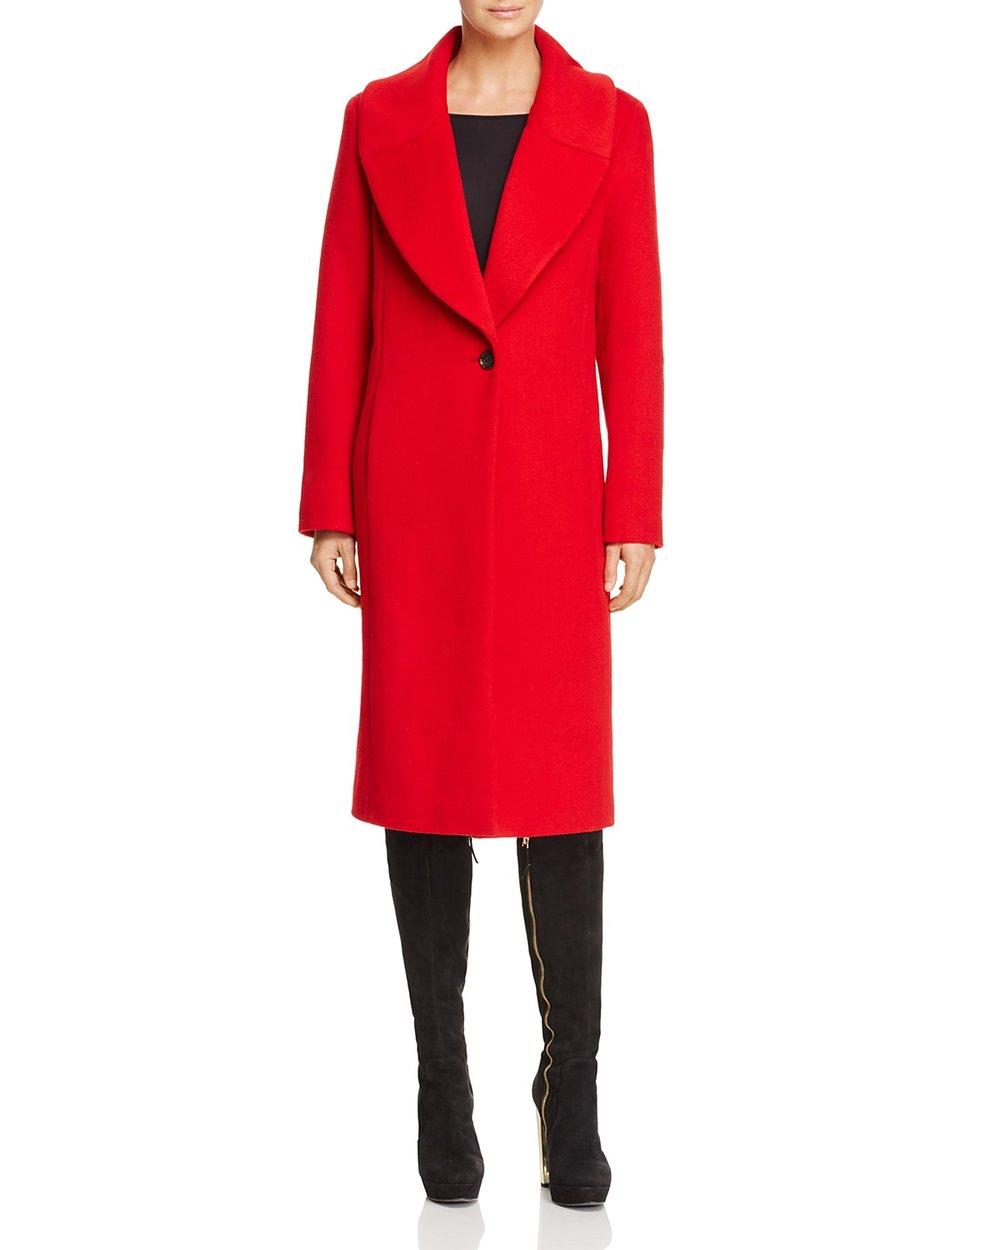 redwool coat.jpg